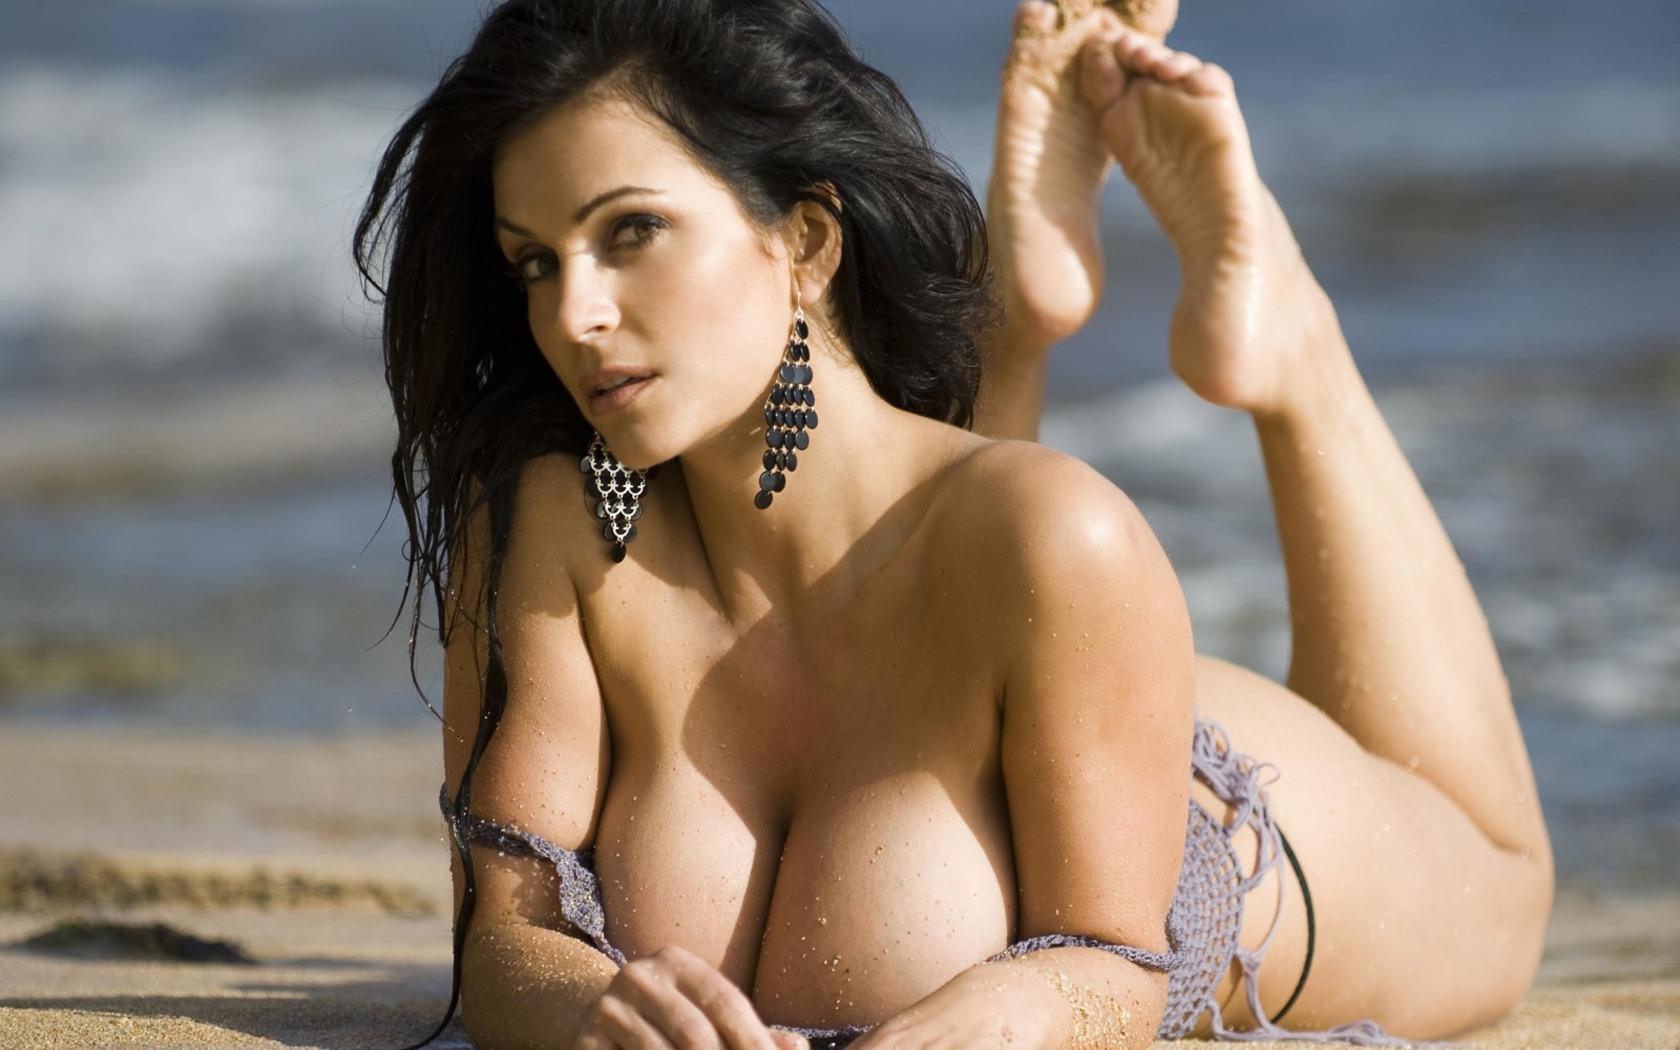 Sexy cute hot girls on the instagram, sargis grigoryan